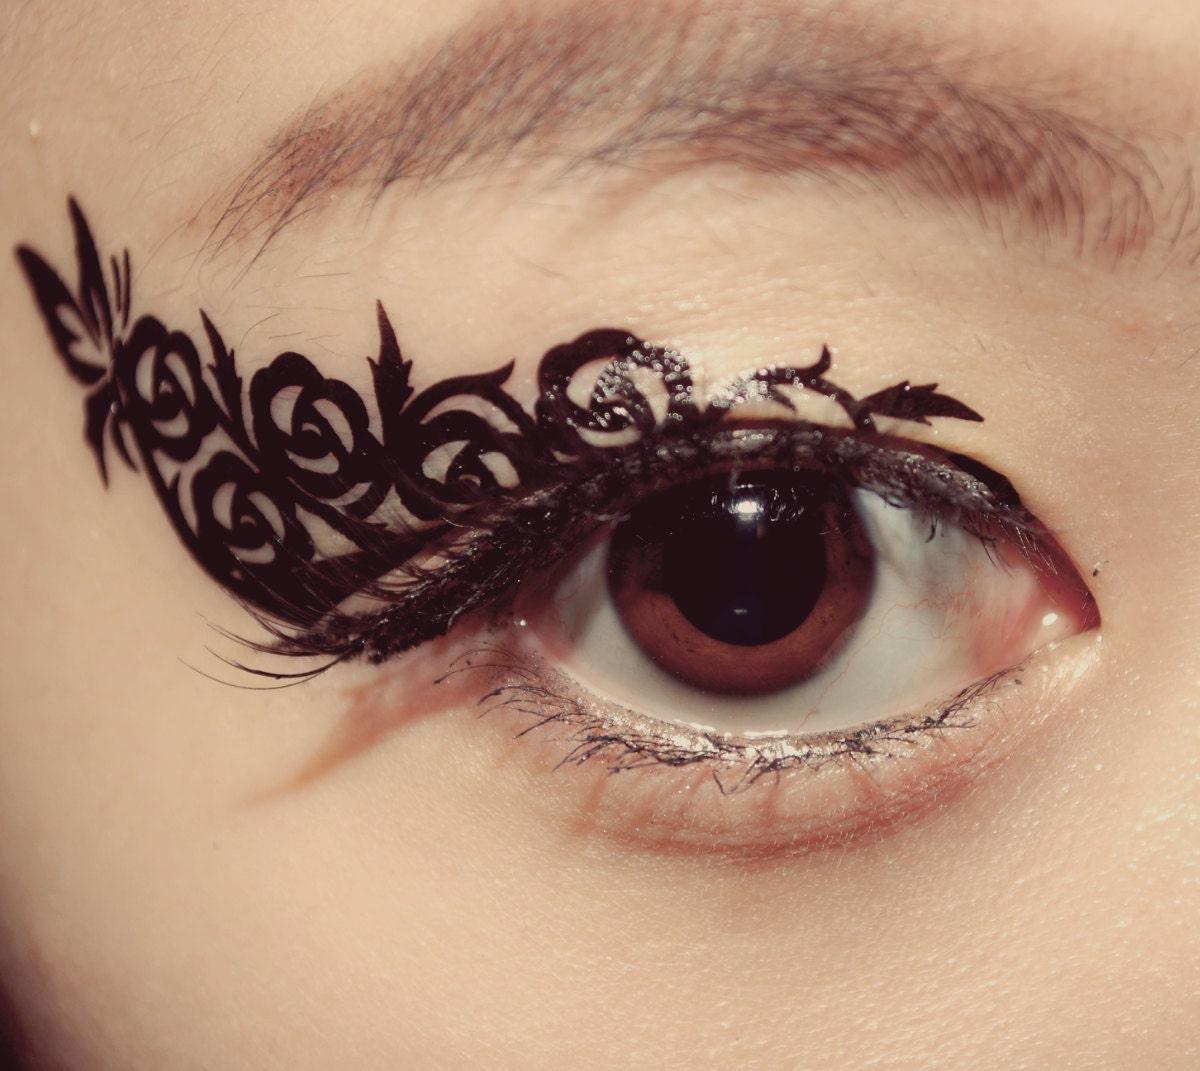 Tattoo eye makeup